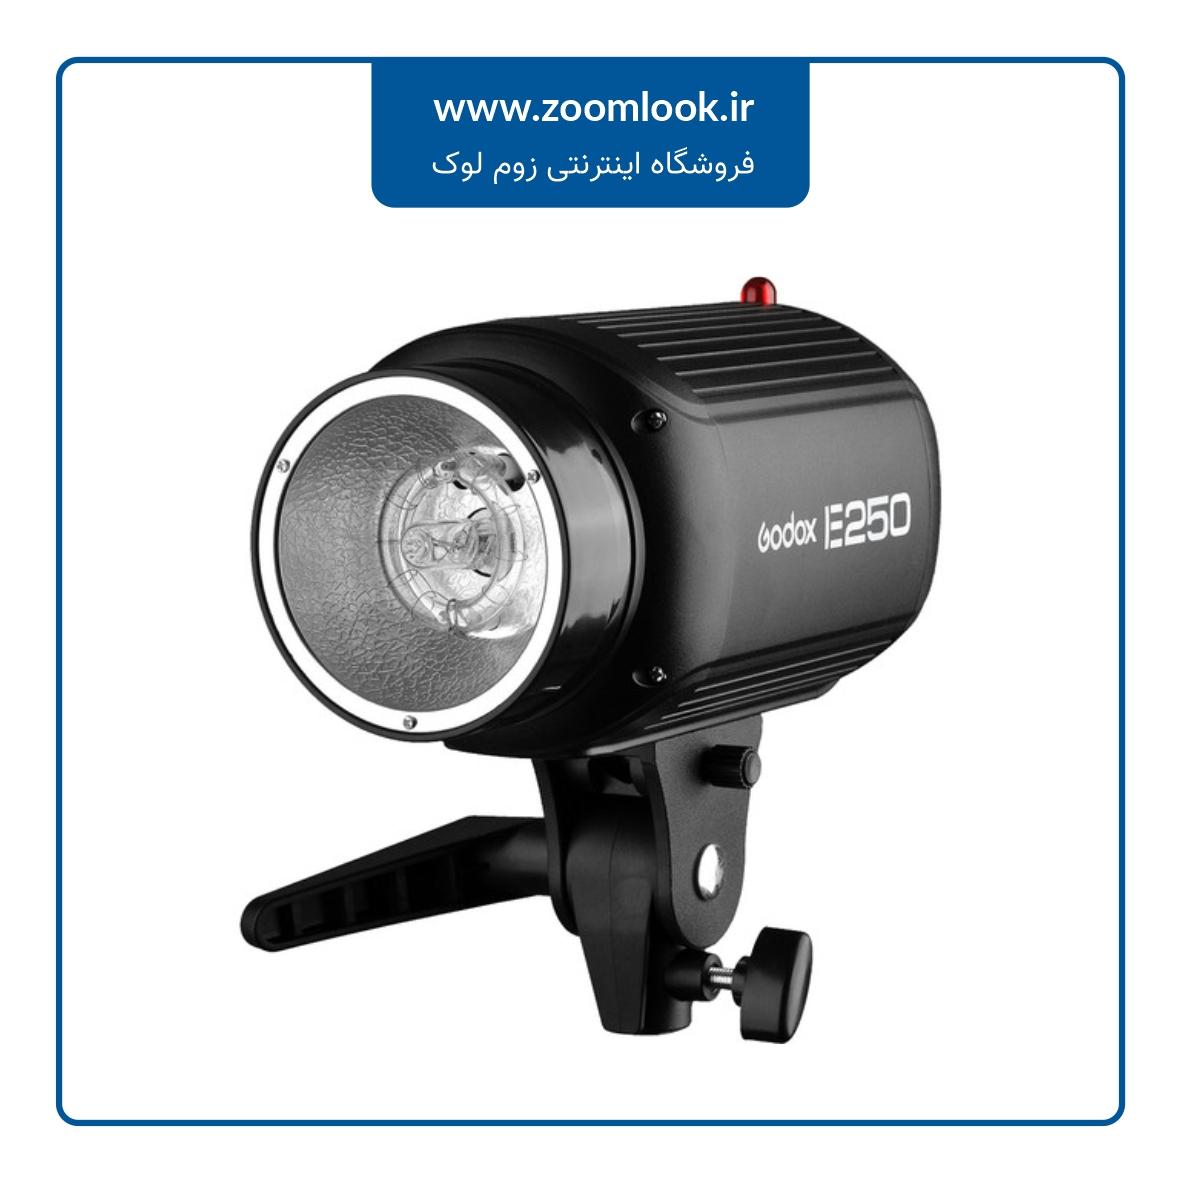 فلاش پرتابل گودکس Godox E250 Flash Head